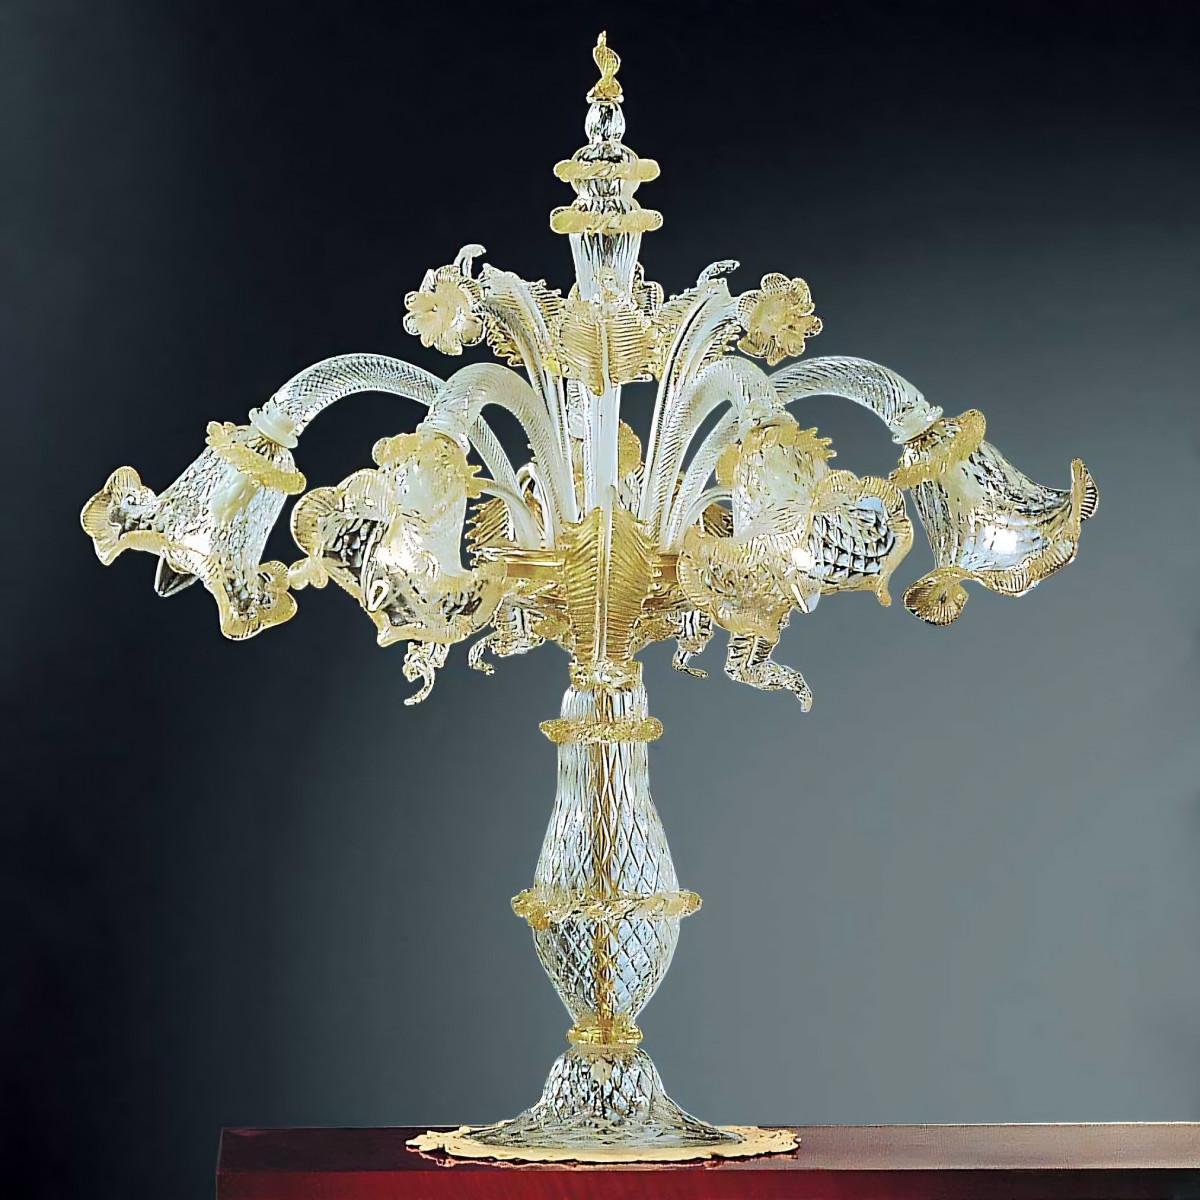 Canal Grande 5 luces gran lámpara de mesa de Murano - color oro transparente